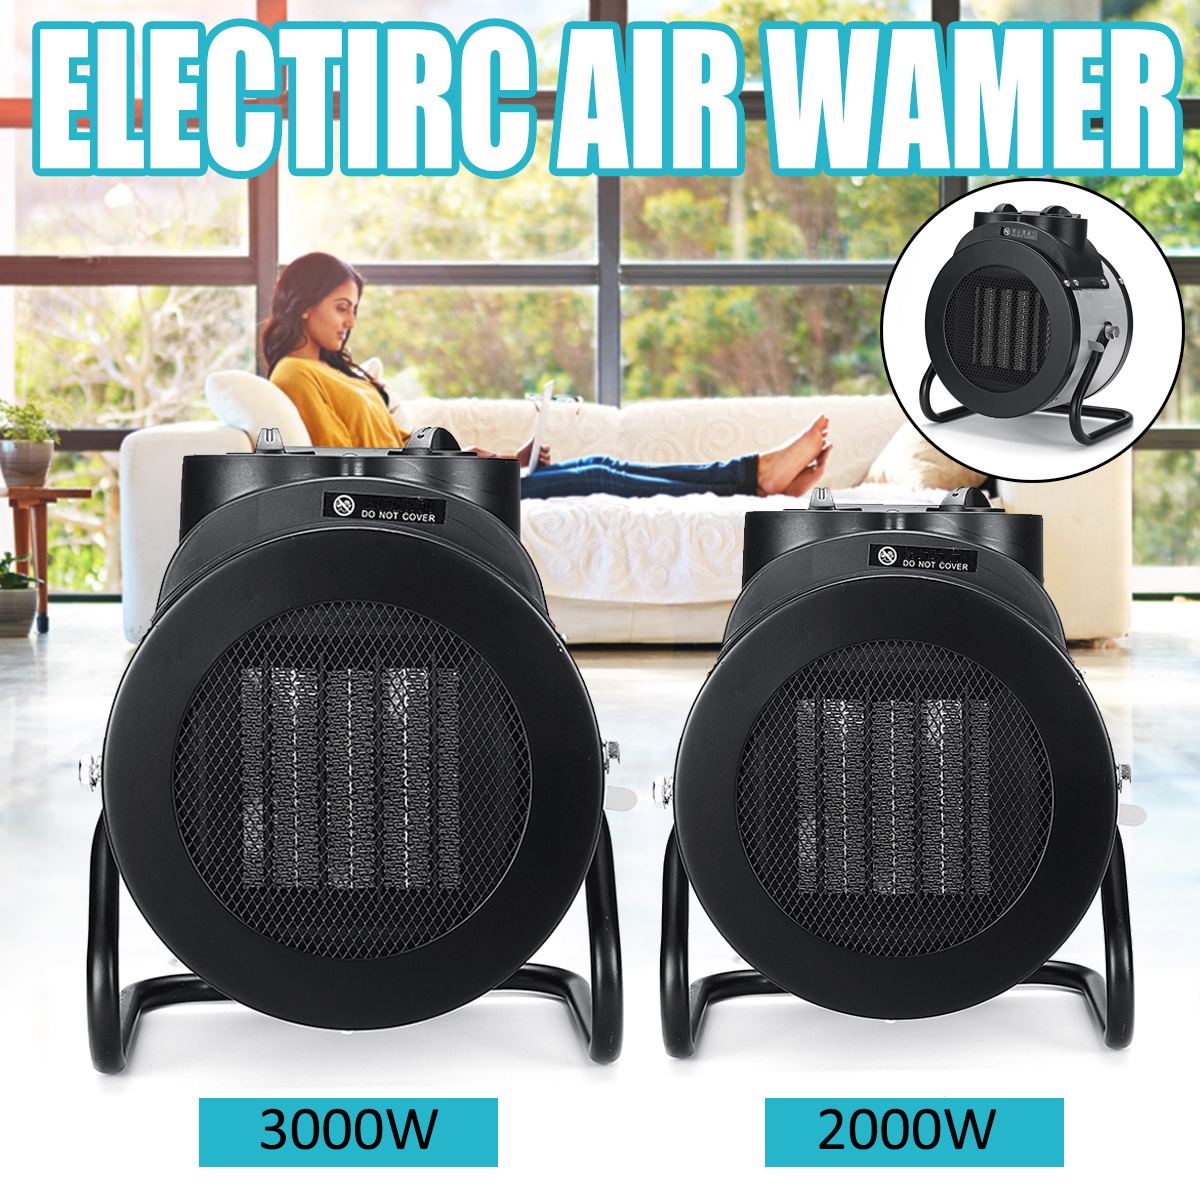 2000/3000W Electric Heaters High Power Warmer Air Blower Electric Industrial Air Space Heater Ceramic Heating Fan Home Bathroom